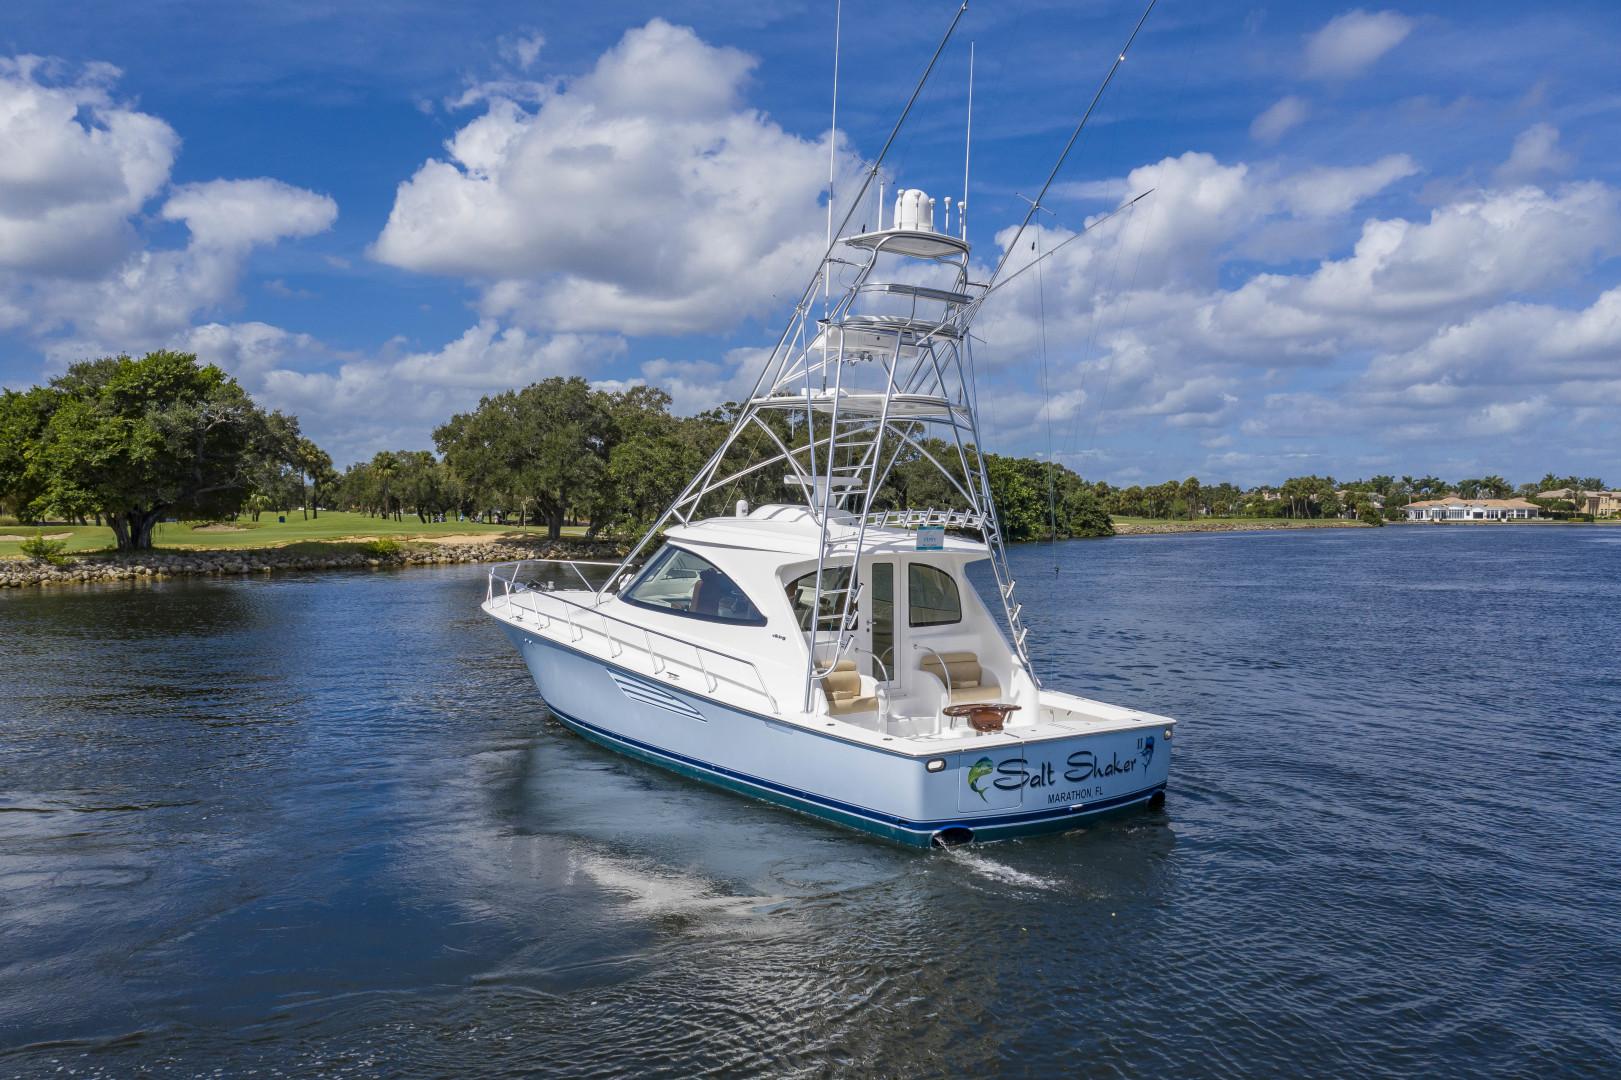 Viking-Sport Tower 2019-Salt Shaker II North Palm Beach-Florida-United States-Salt Shaker II-1498752 | Thumbnail